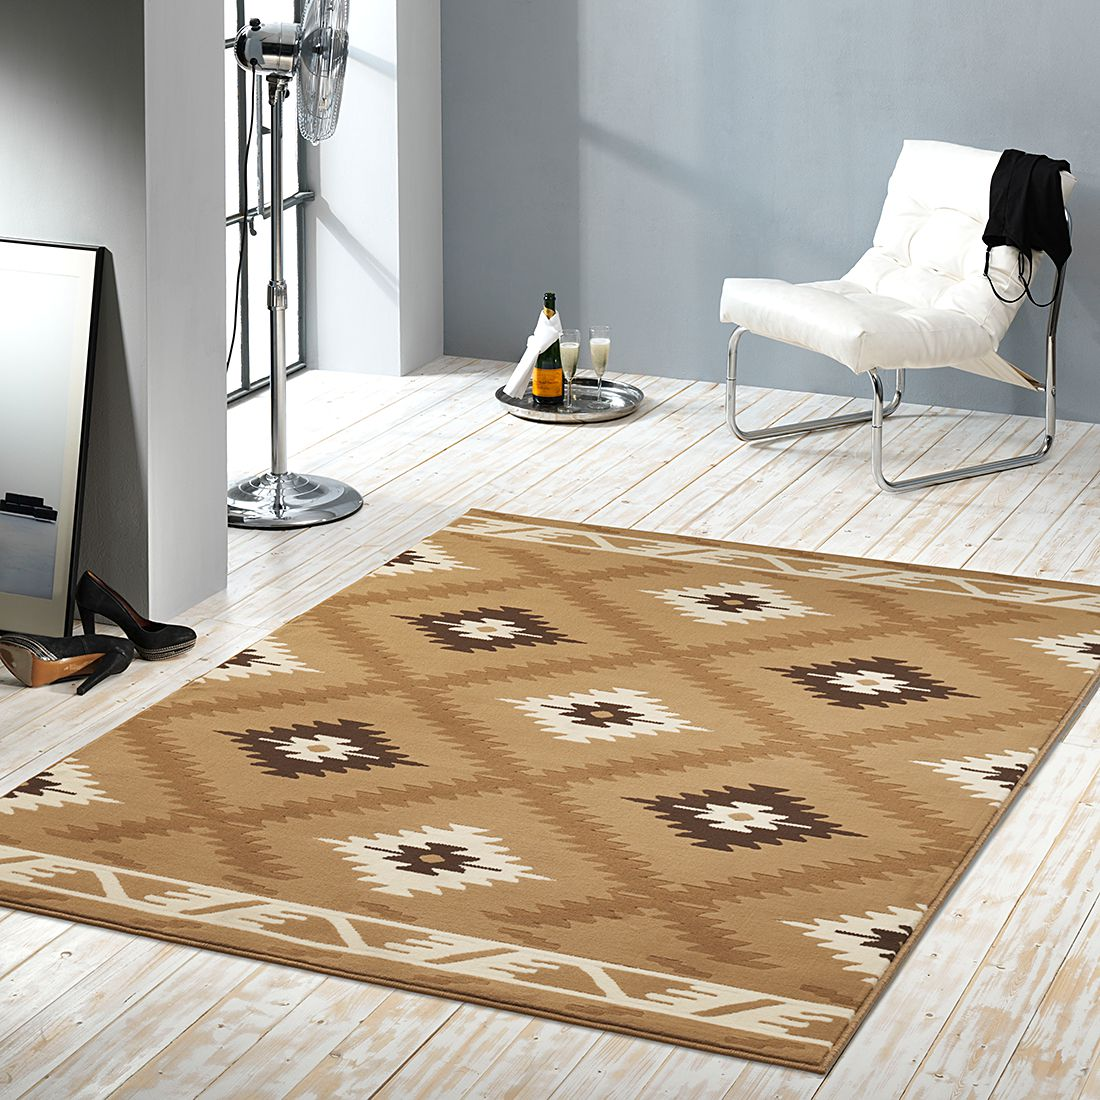 teppich hamla beige 160 x 230 cm hanse home. Black Bedroom Furniture Sets. Home Design Ideas